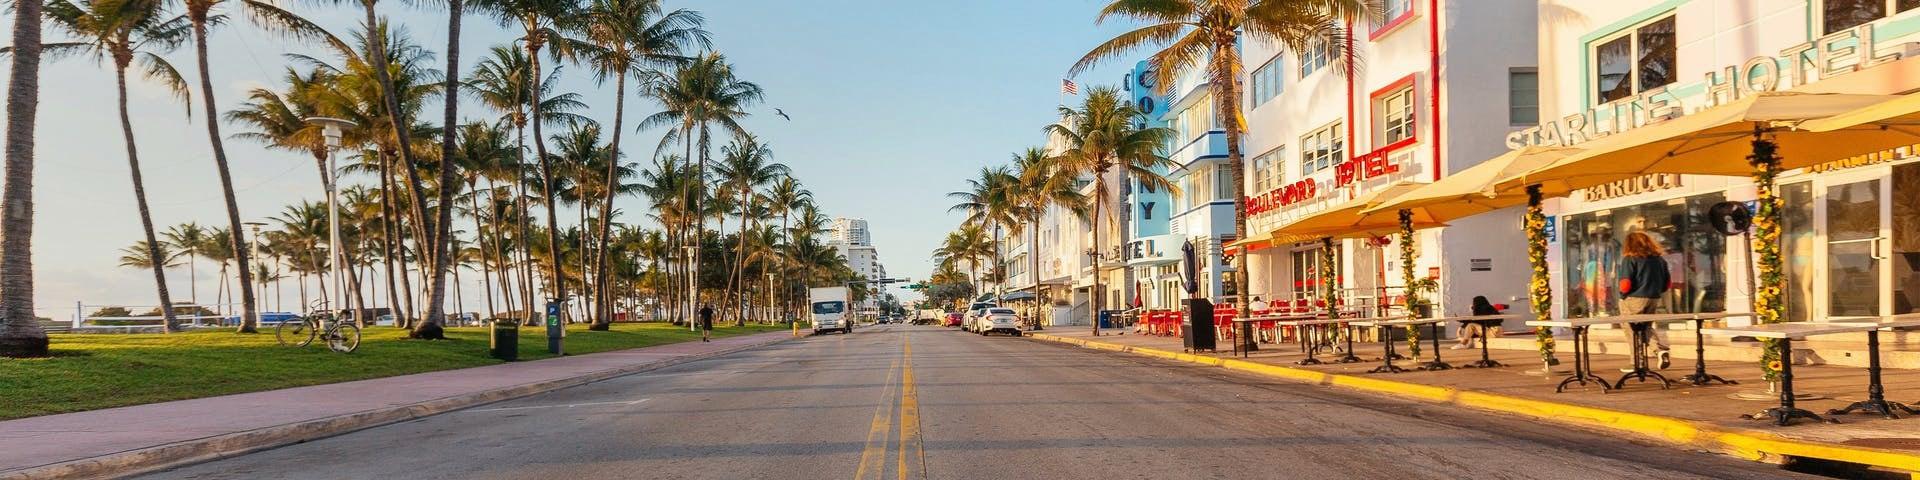 Street view of Ocean Drive on Miami East Coast USA